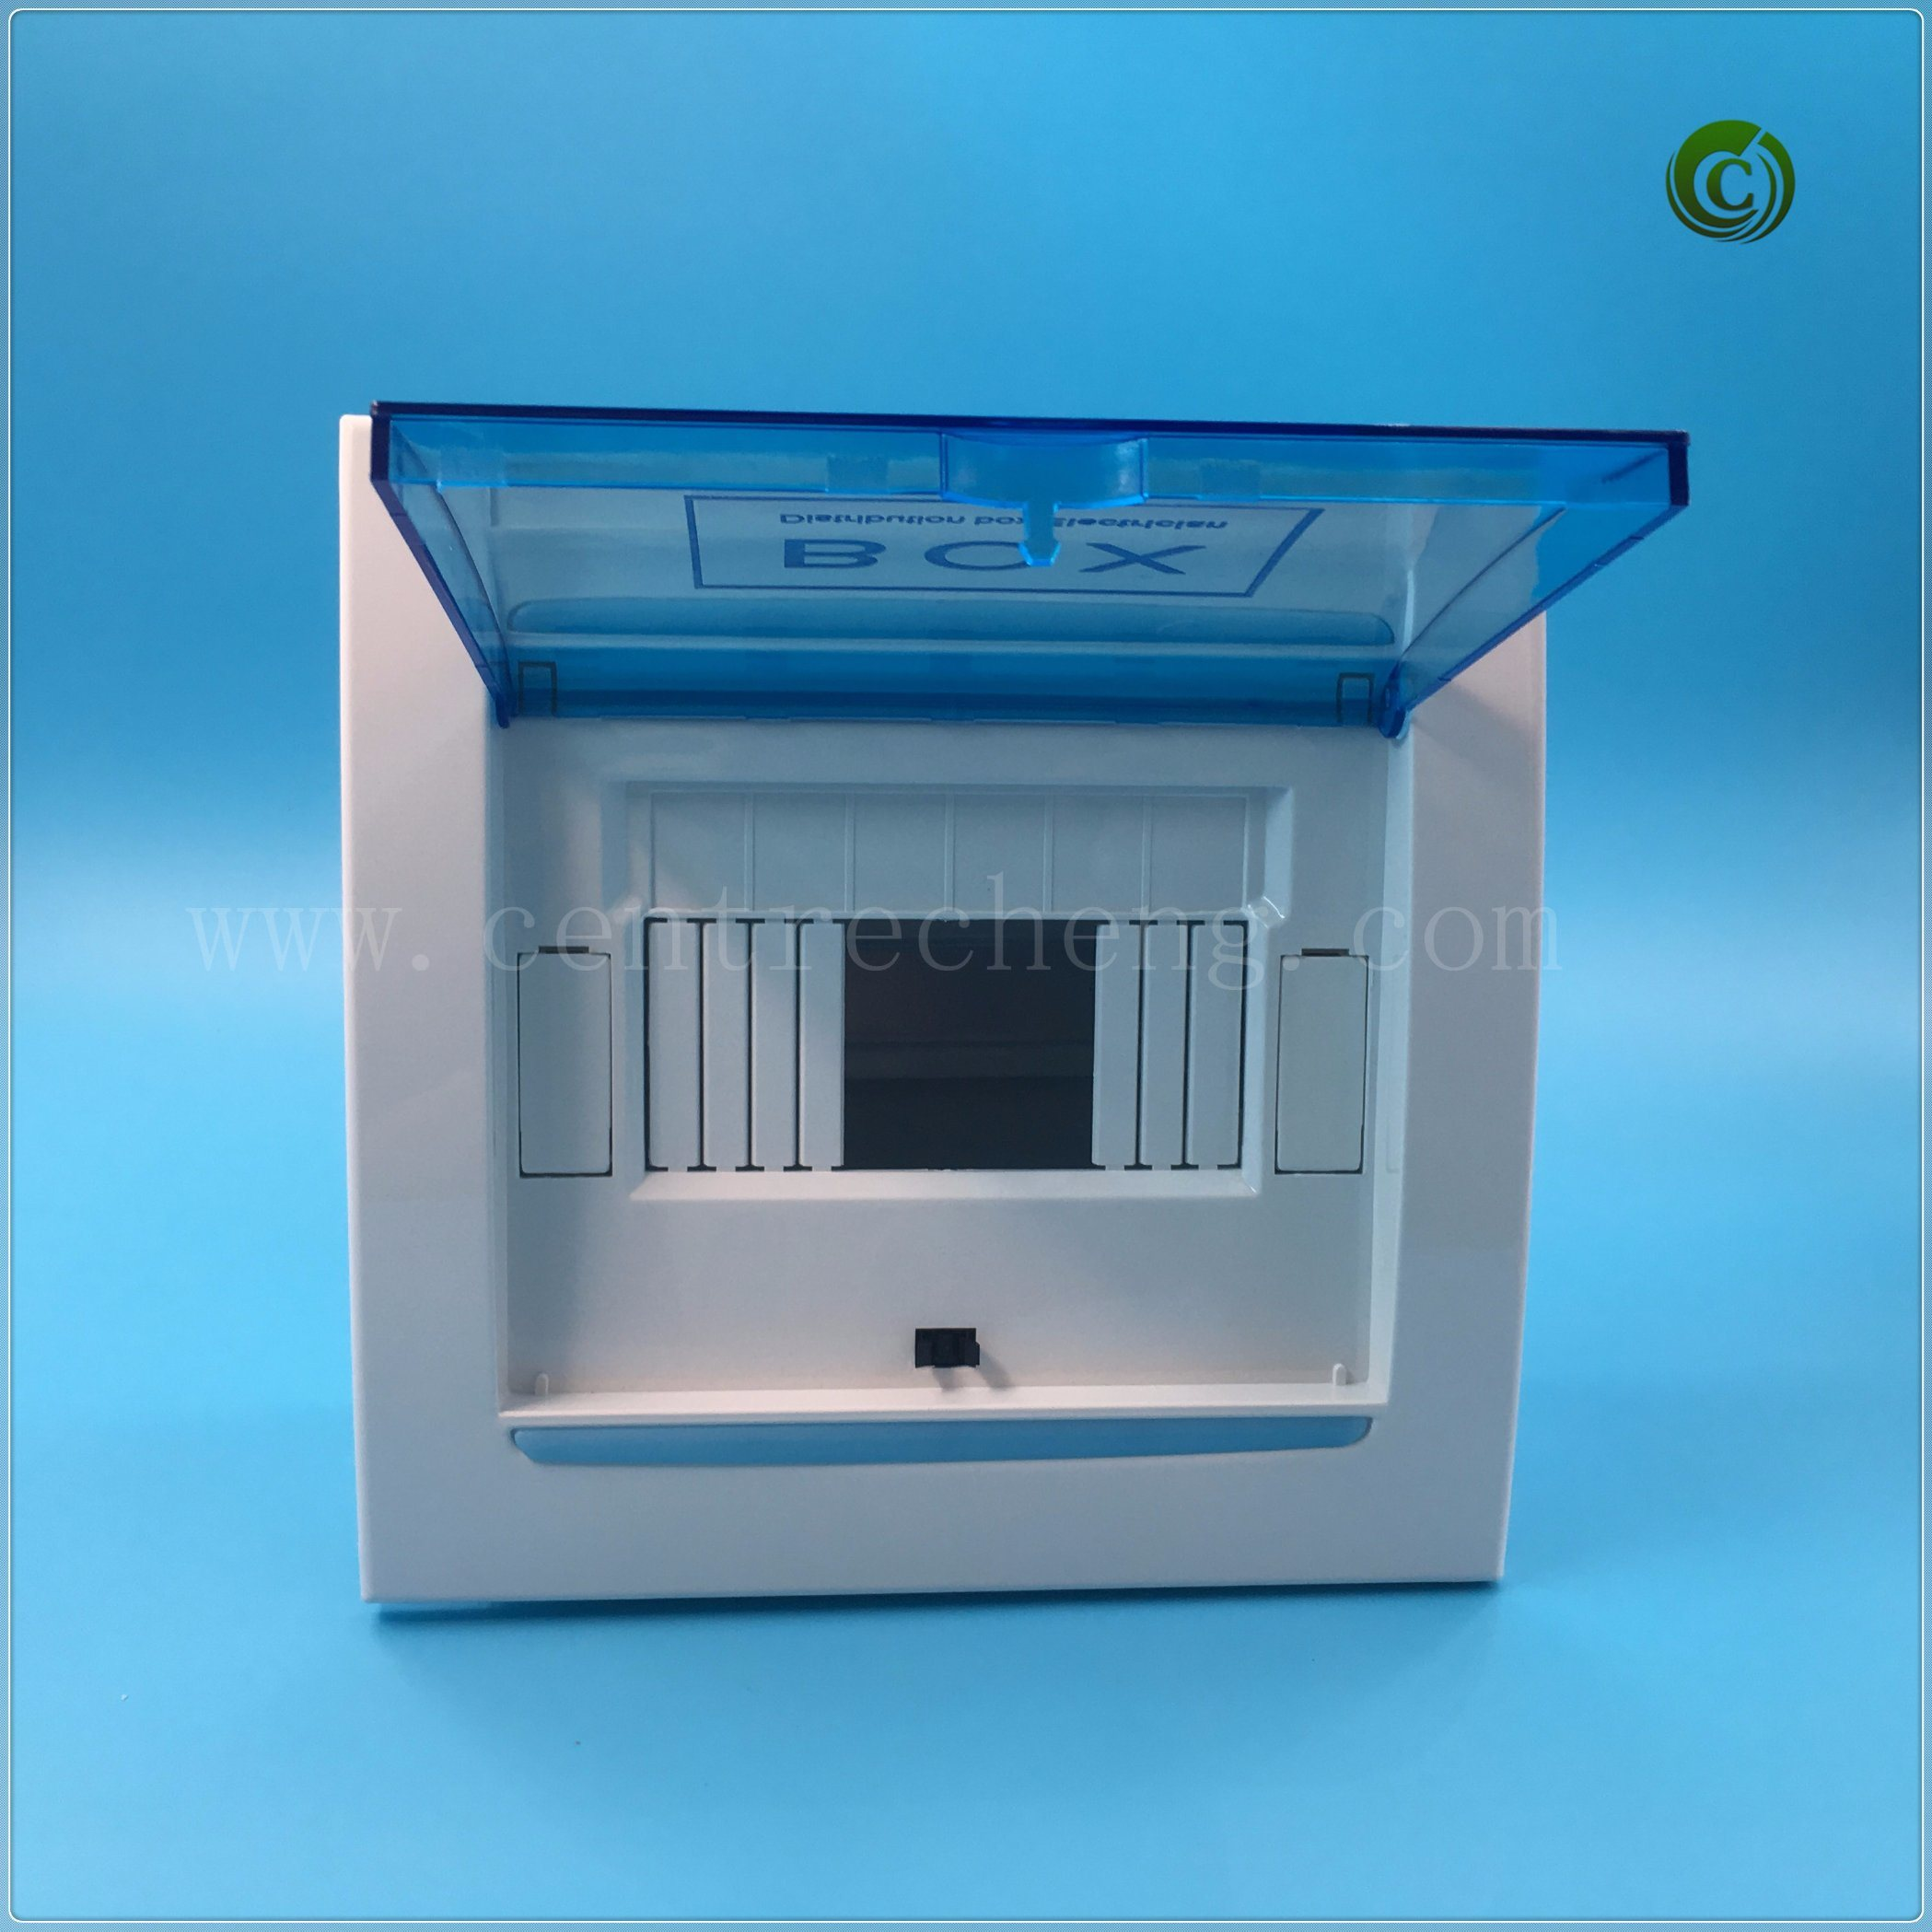 China IP Home MCB Fuse Box 4-6 Way Electric Distribution Board ...